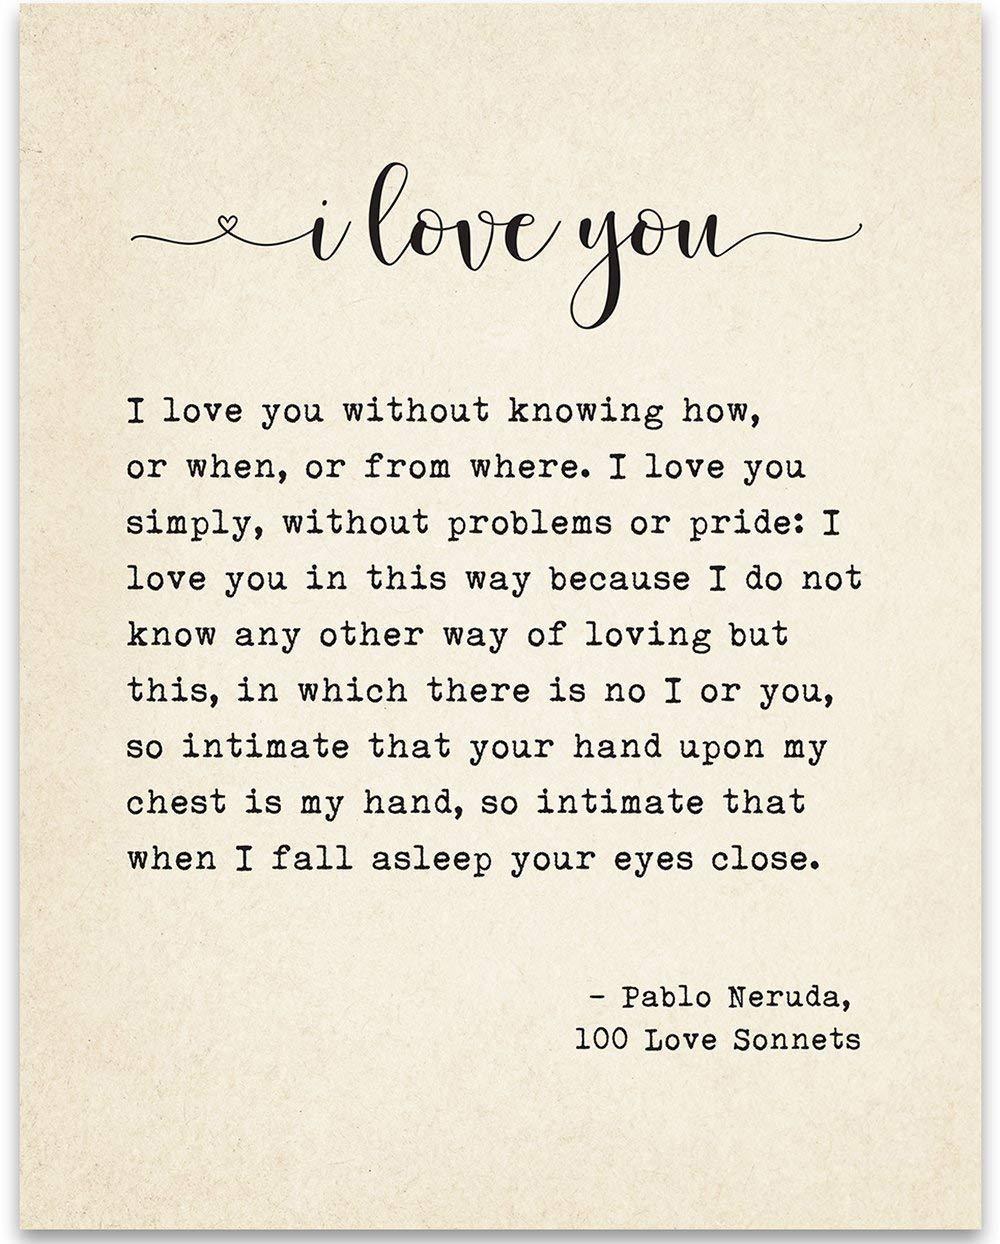 Amazoncom I Love You Sonnet Pablo Neruda Book Page